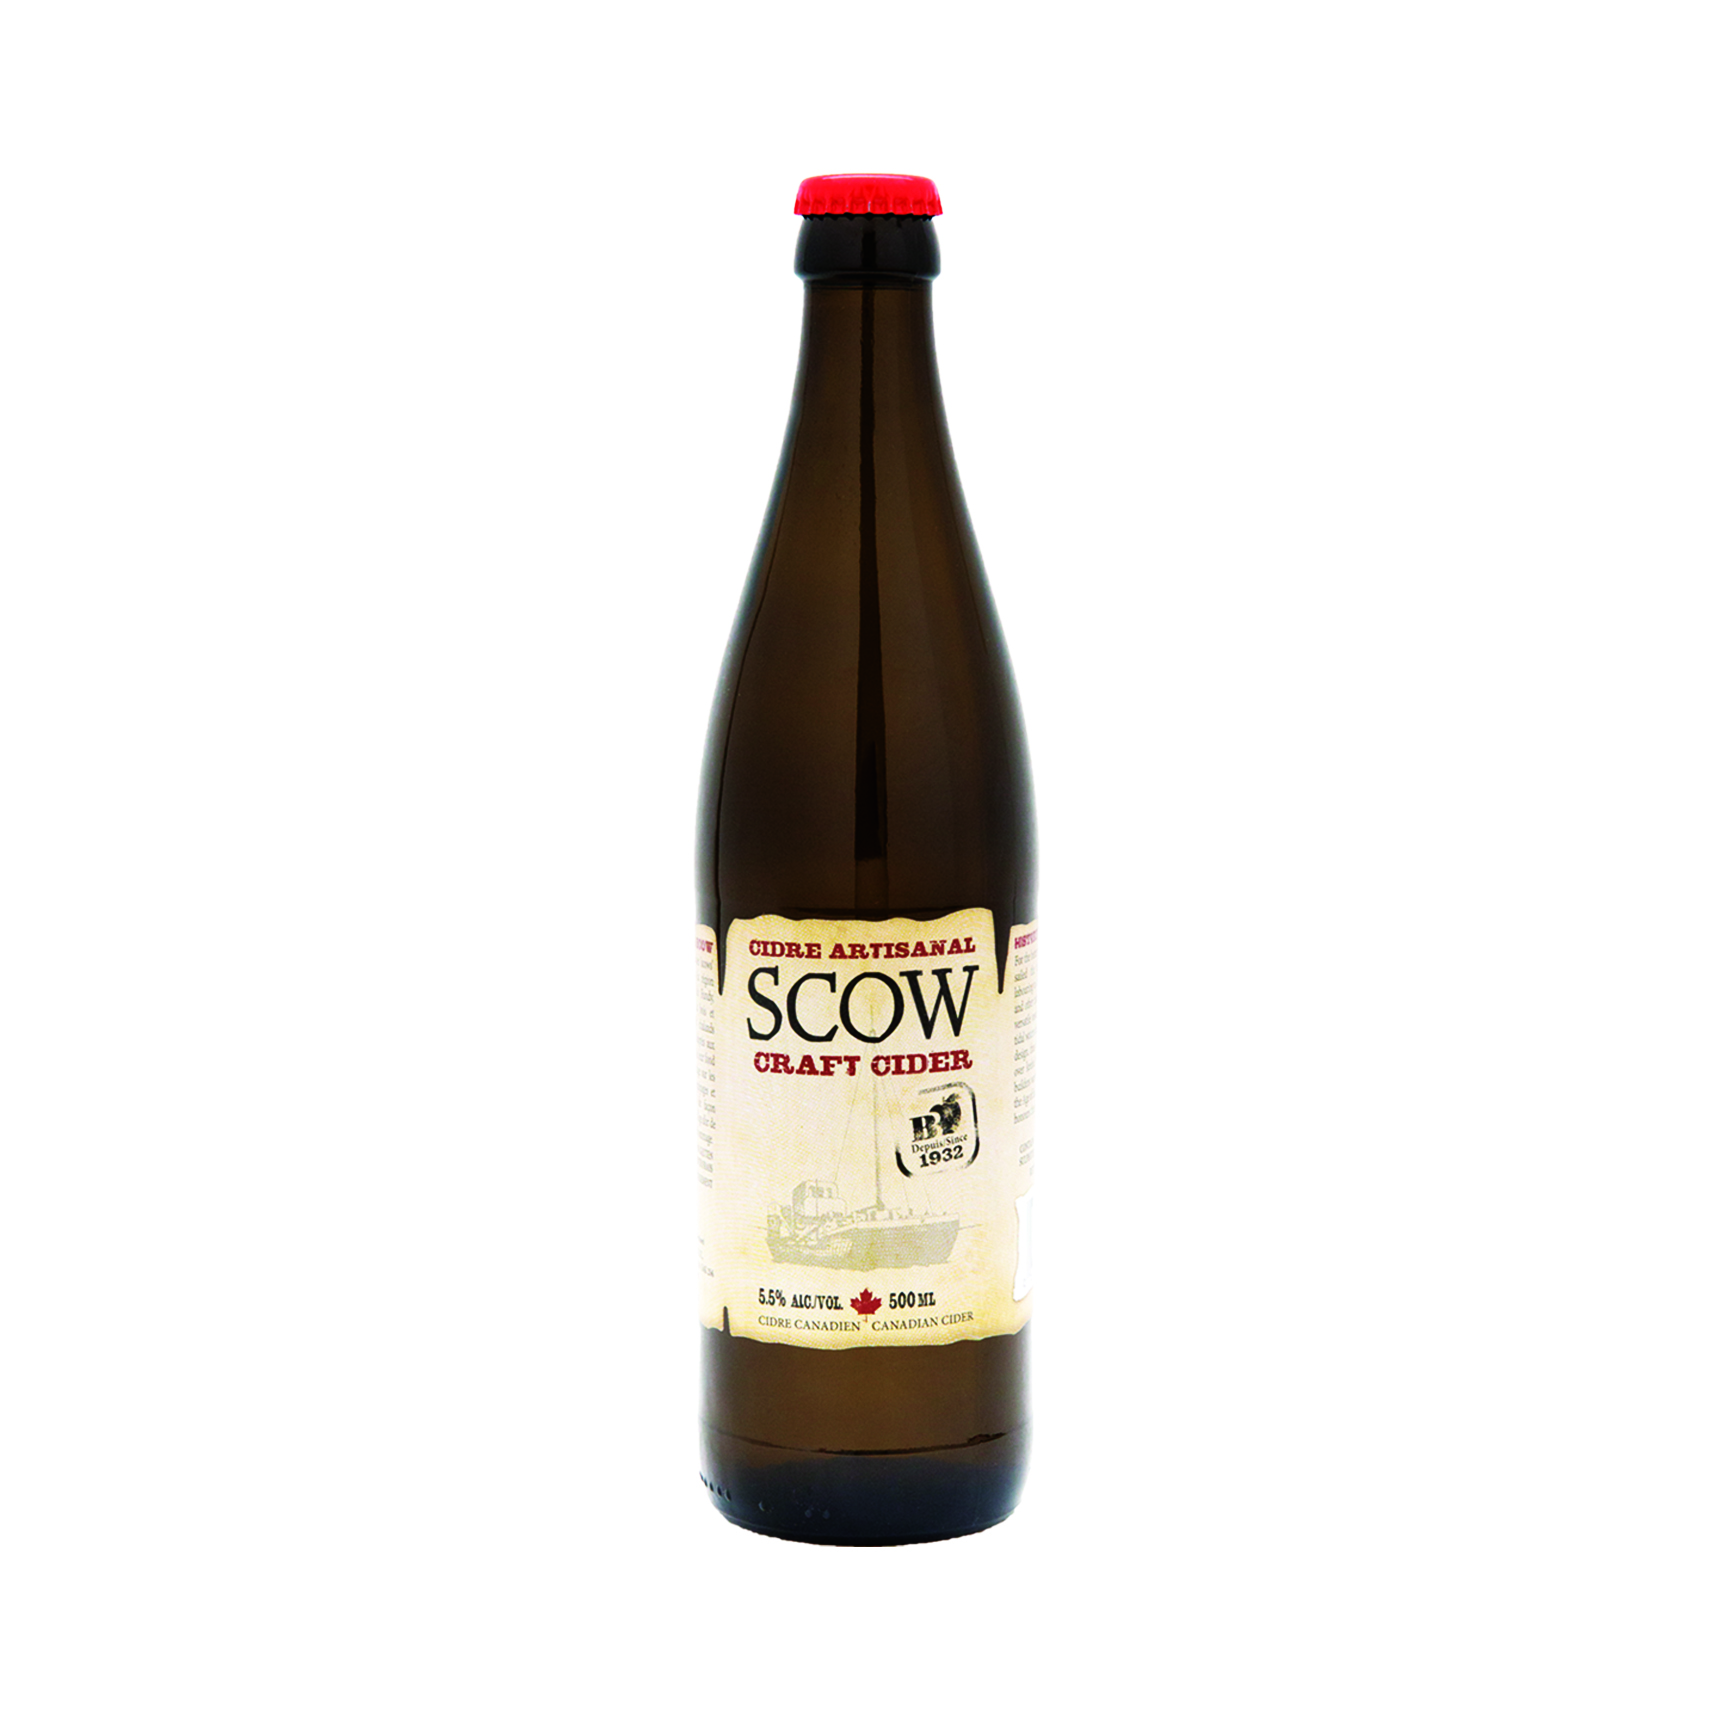 Cidre Artisanal SCOW Craft Cider